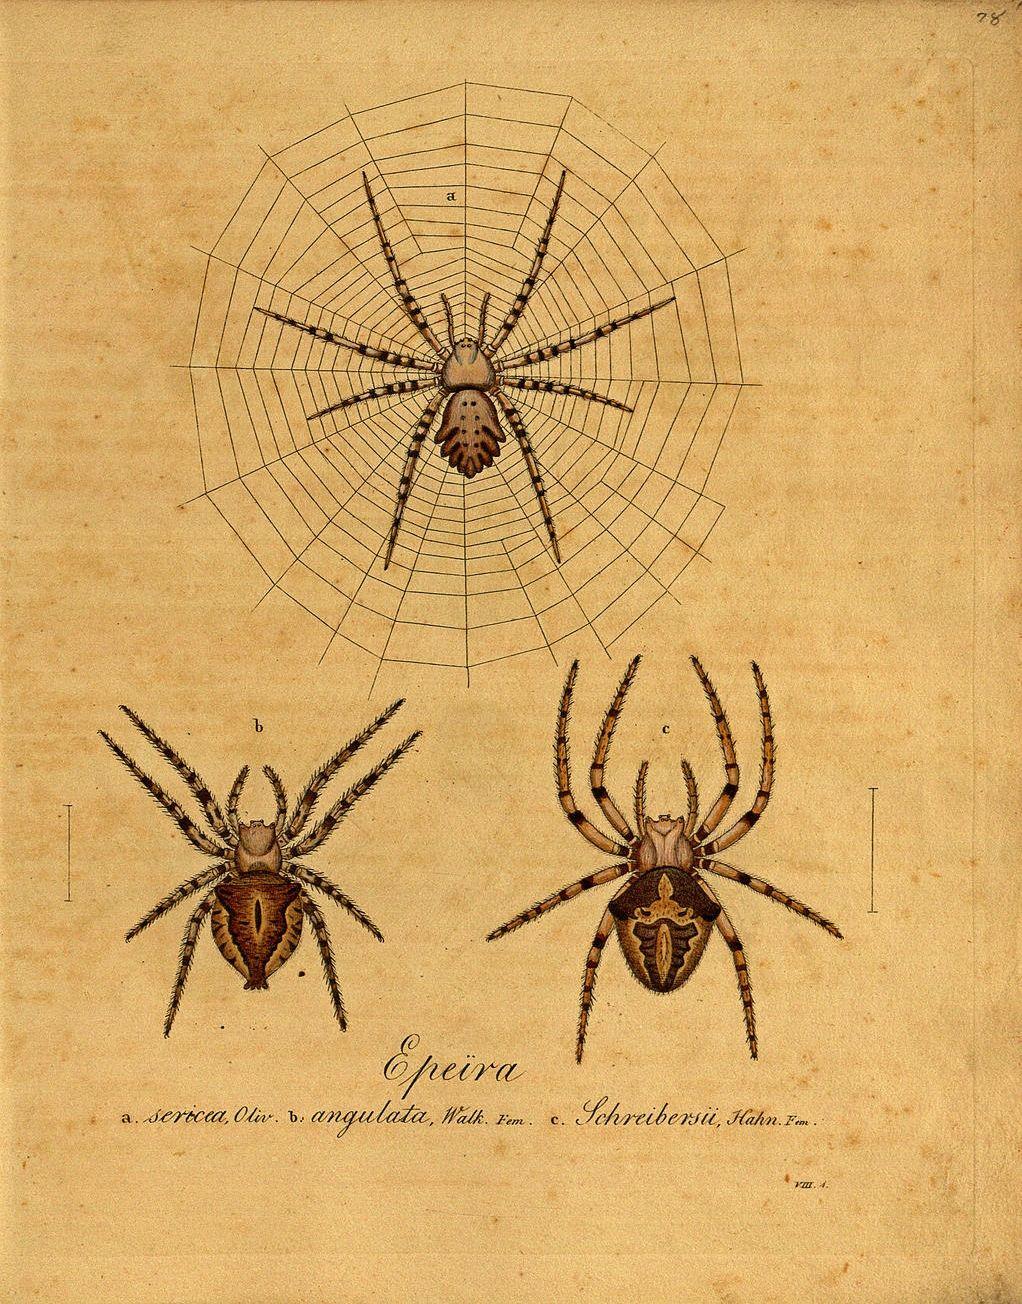 spider | Scientific Illustration | Pinterest | Spider, Illustrations ...